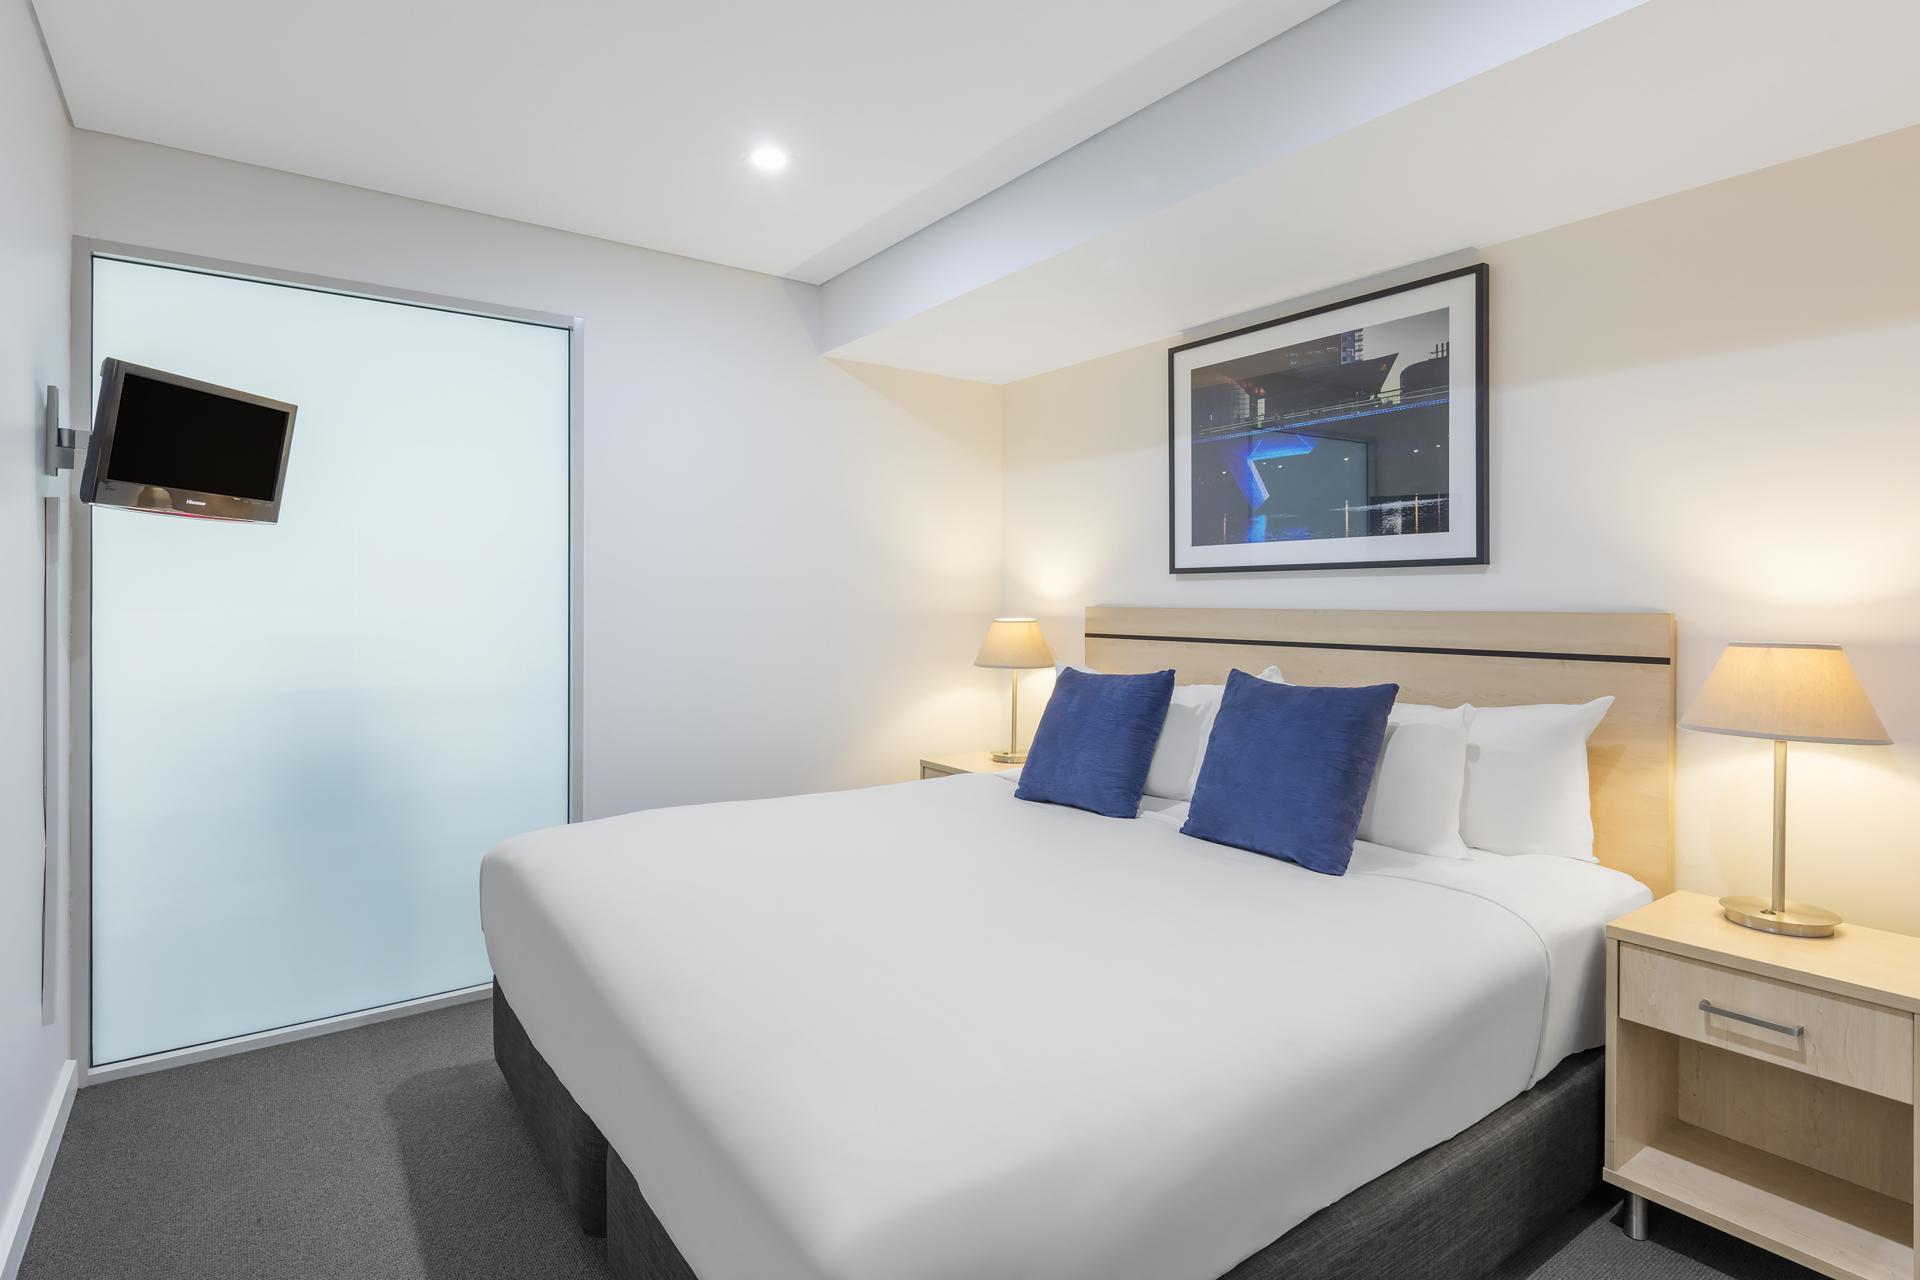 Bedroom at Oaks Adelaide Embassy Suites